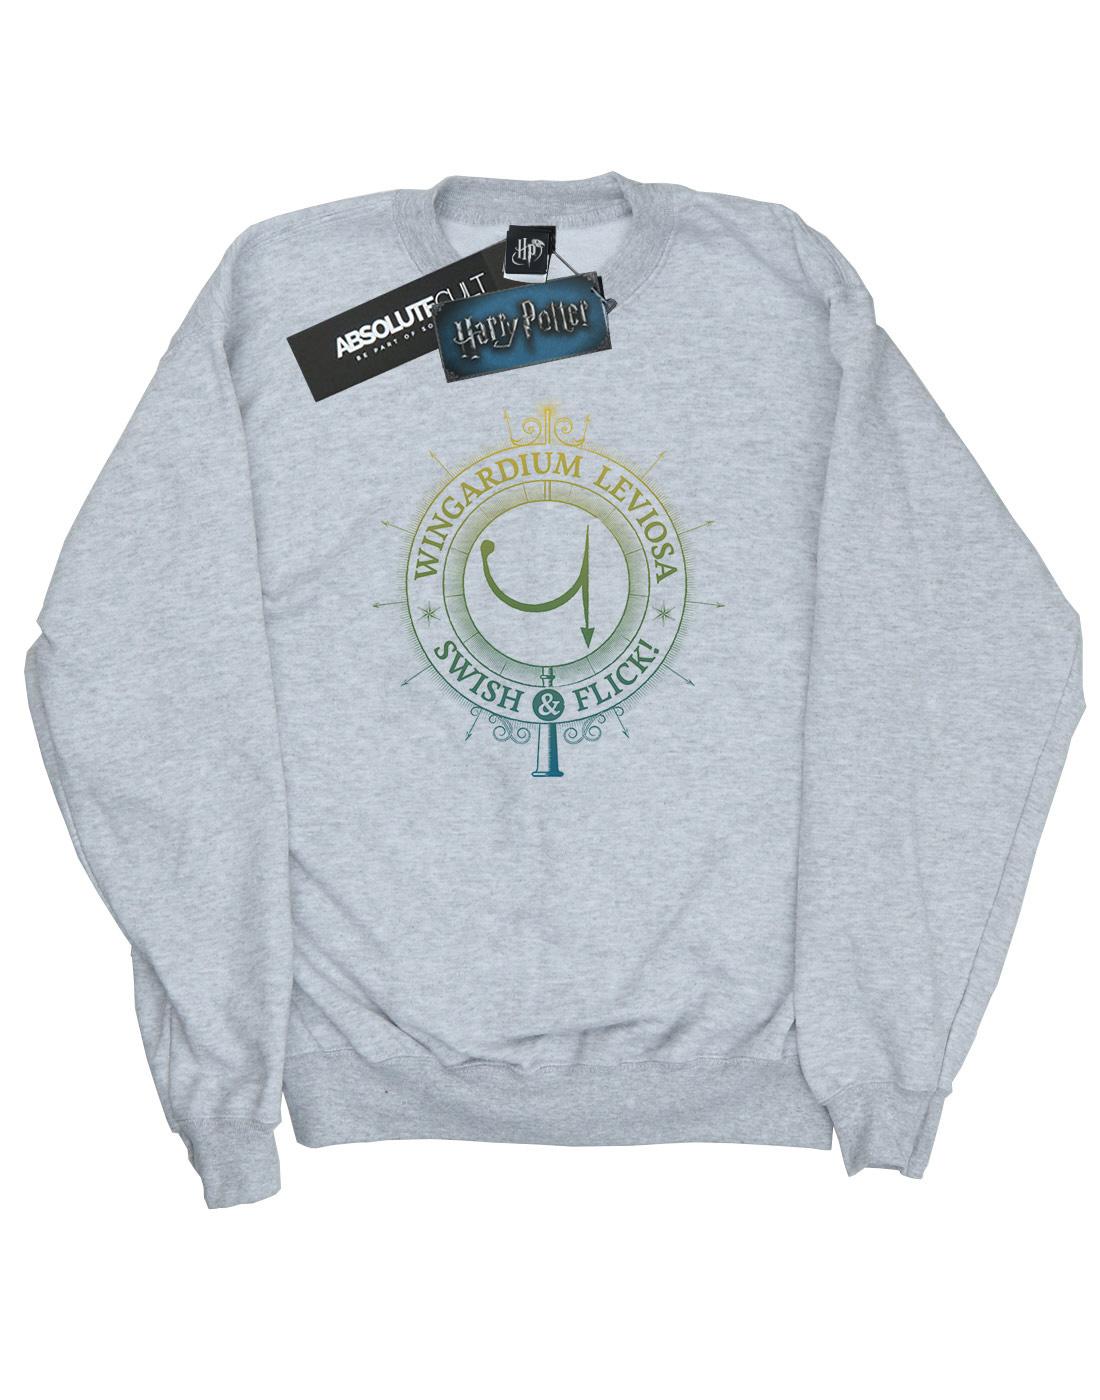 Harry-Potter-mujer-Wingardium-Leviosa-Spells-Charms-Camisa-De-Entrenamiento